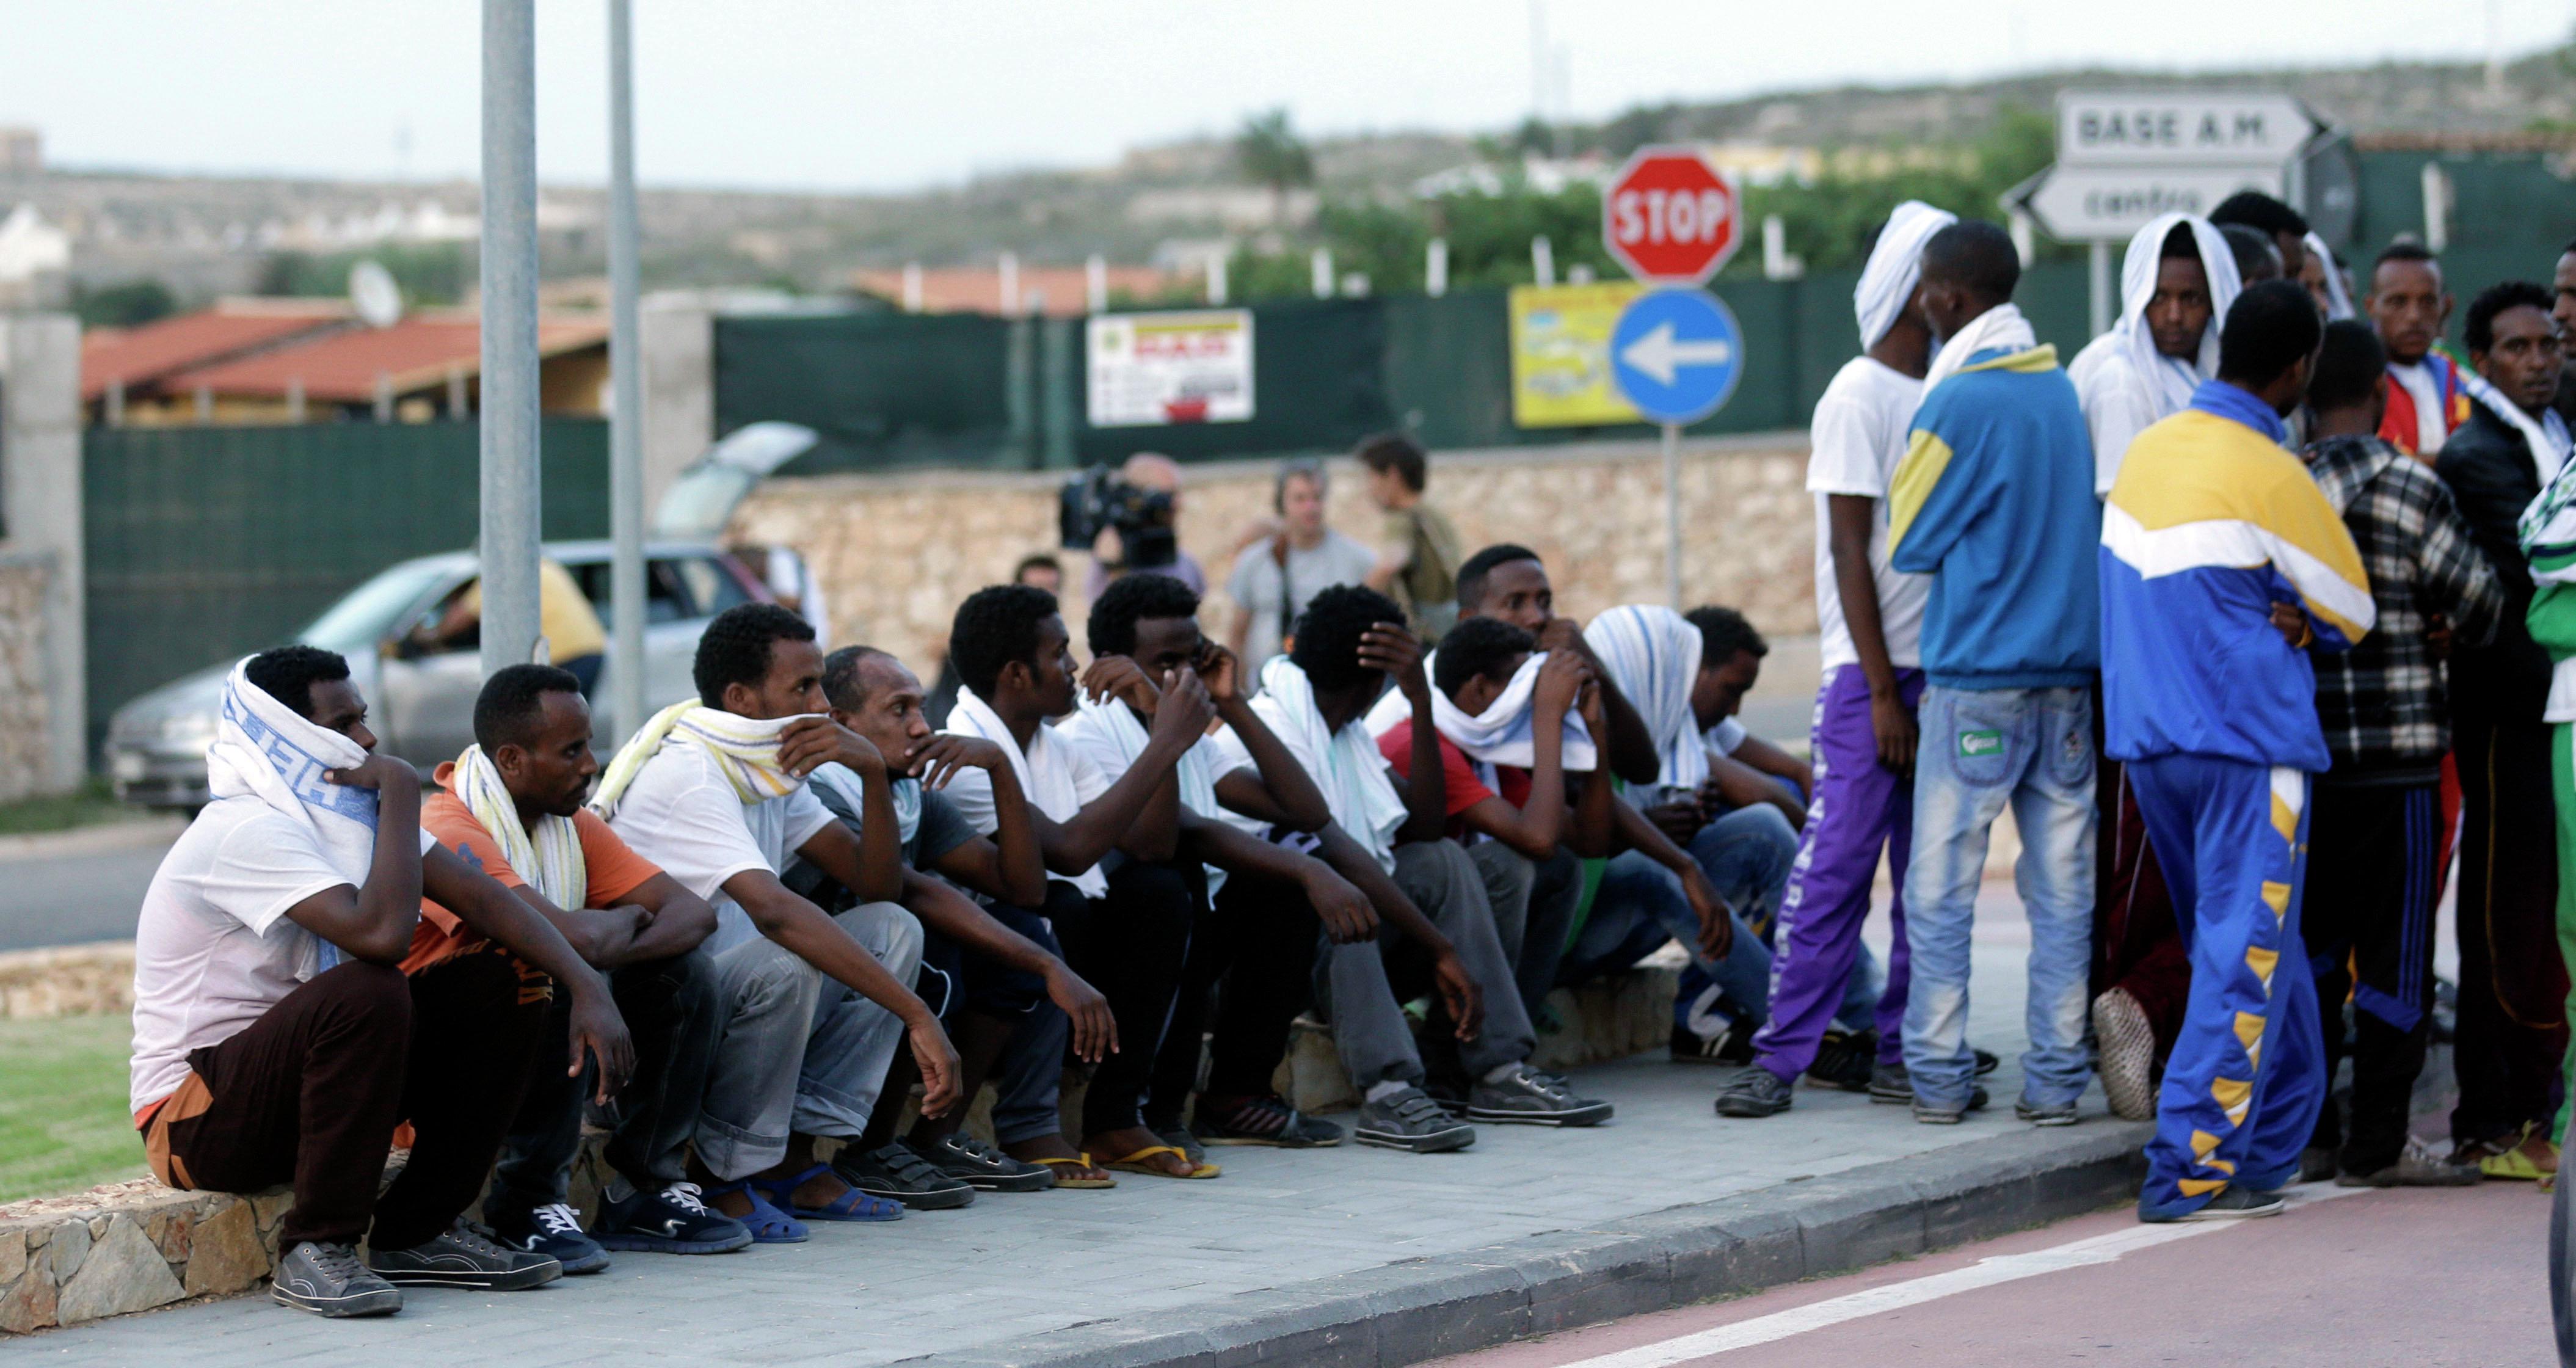 Migrants from Eritrea in Lampedusa, Italy